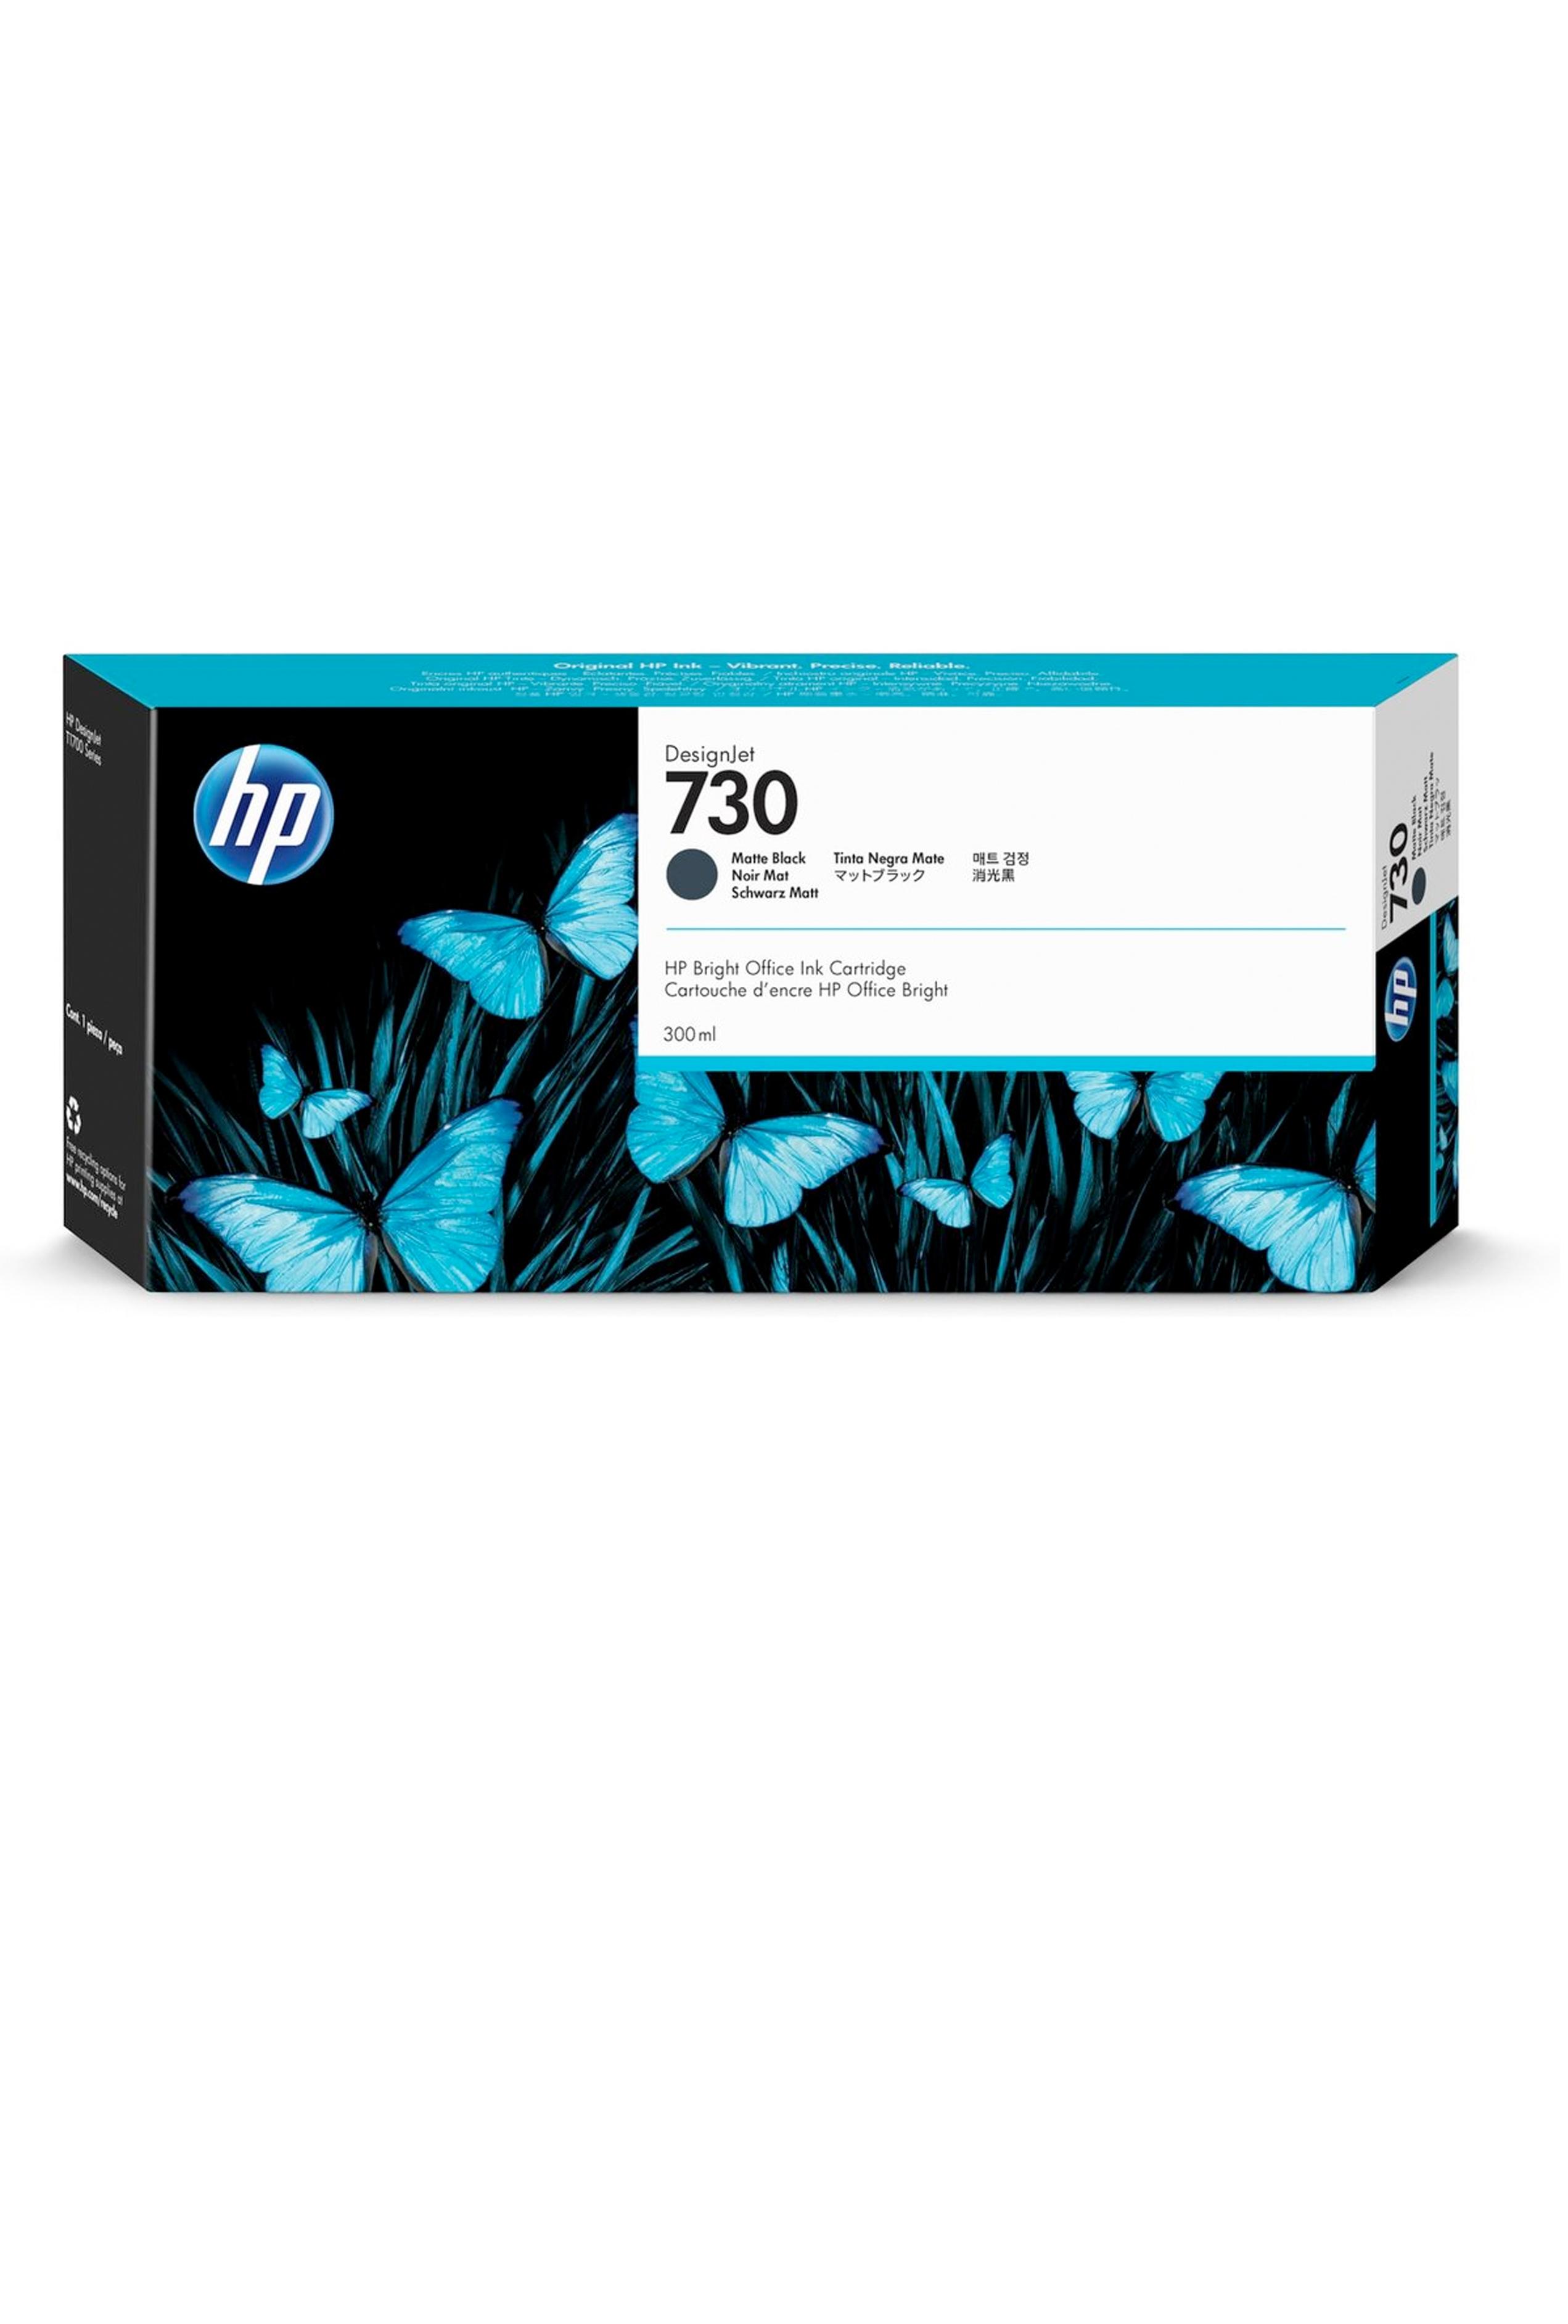 HP 730 300-ml Matte Black DesignJet Ink Cartridge (P2V71A)